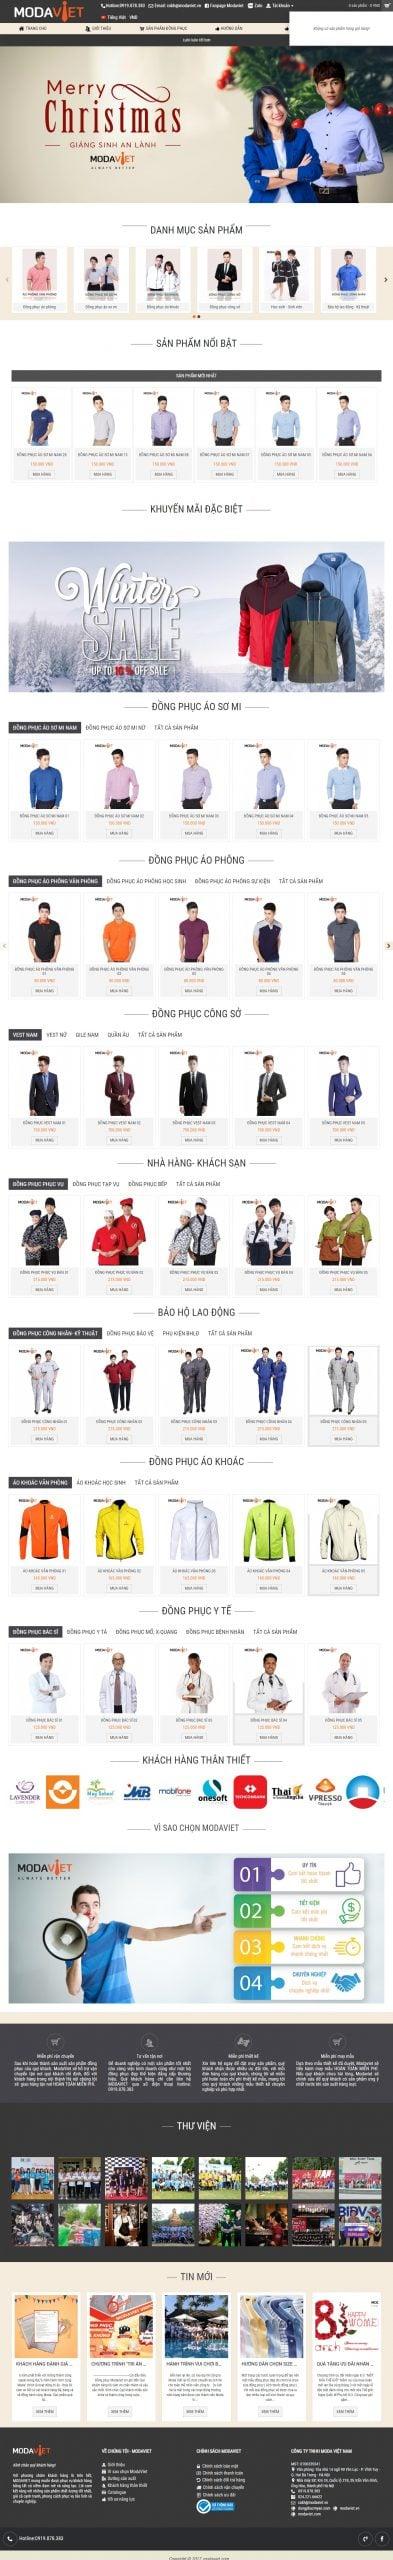 Mẫu thiết kế website bán hàng ĐỒNG PHỤC MODAVIET-modaviet.com